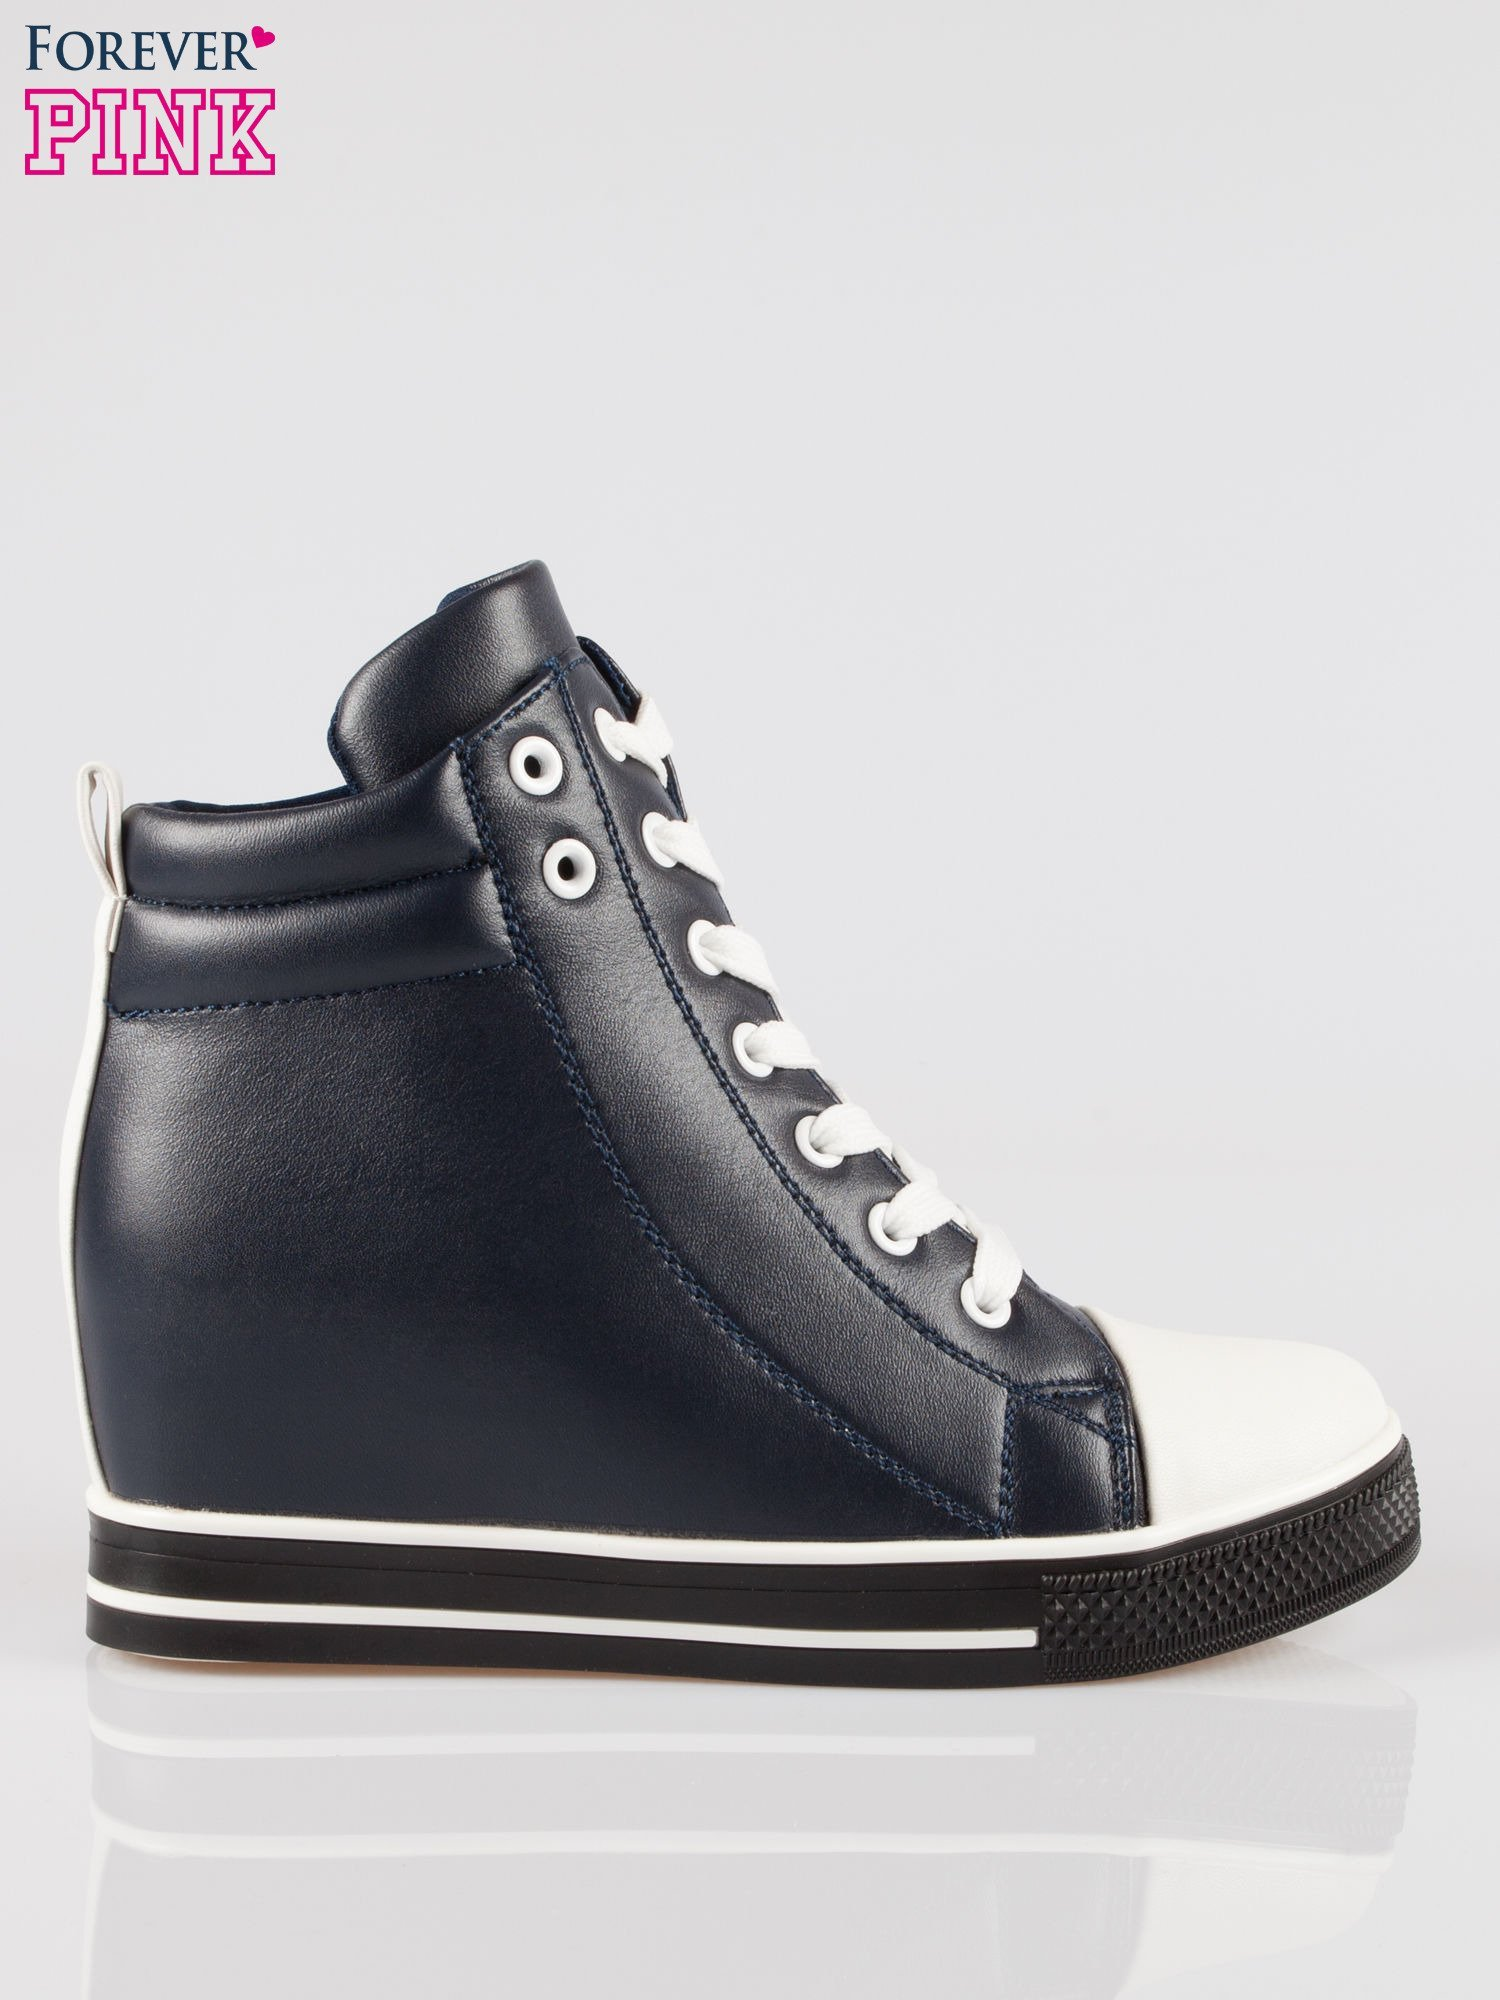 Cienoniebieskie sneakersy trampki cap toe na koturnie                                  zdj.                                  1